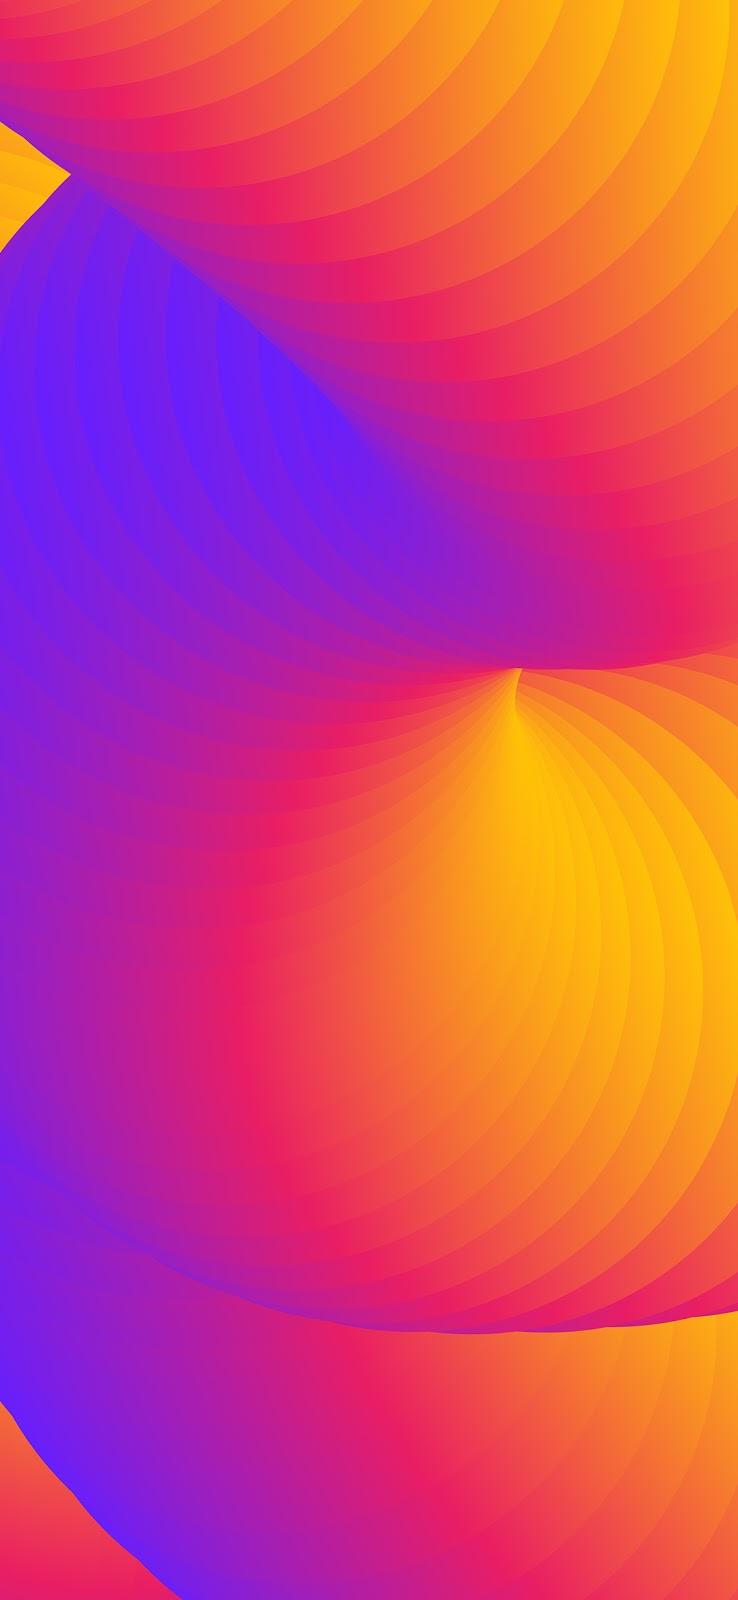 cool abstract orange circles wallpaper